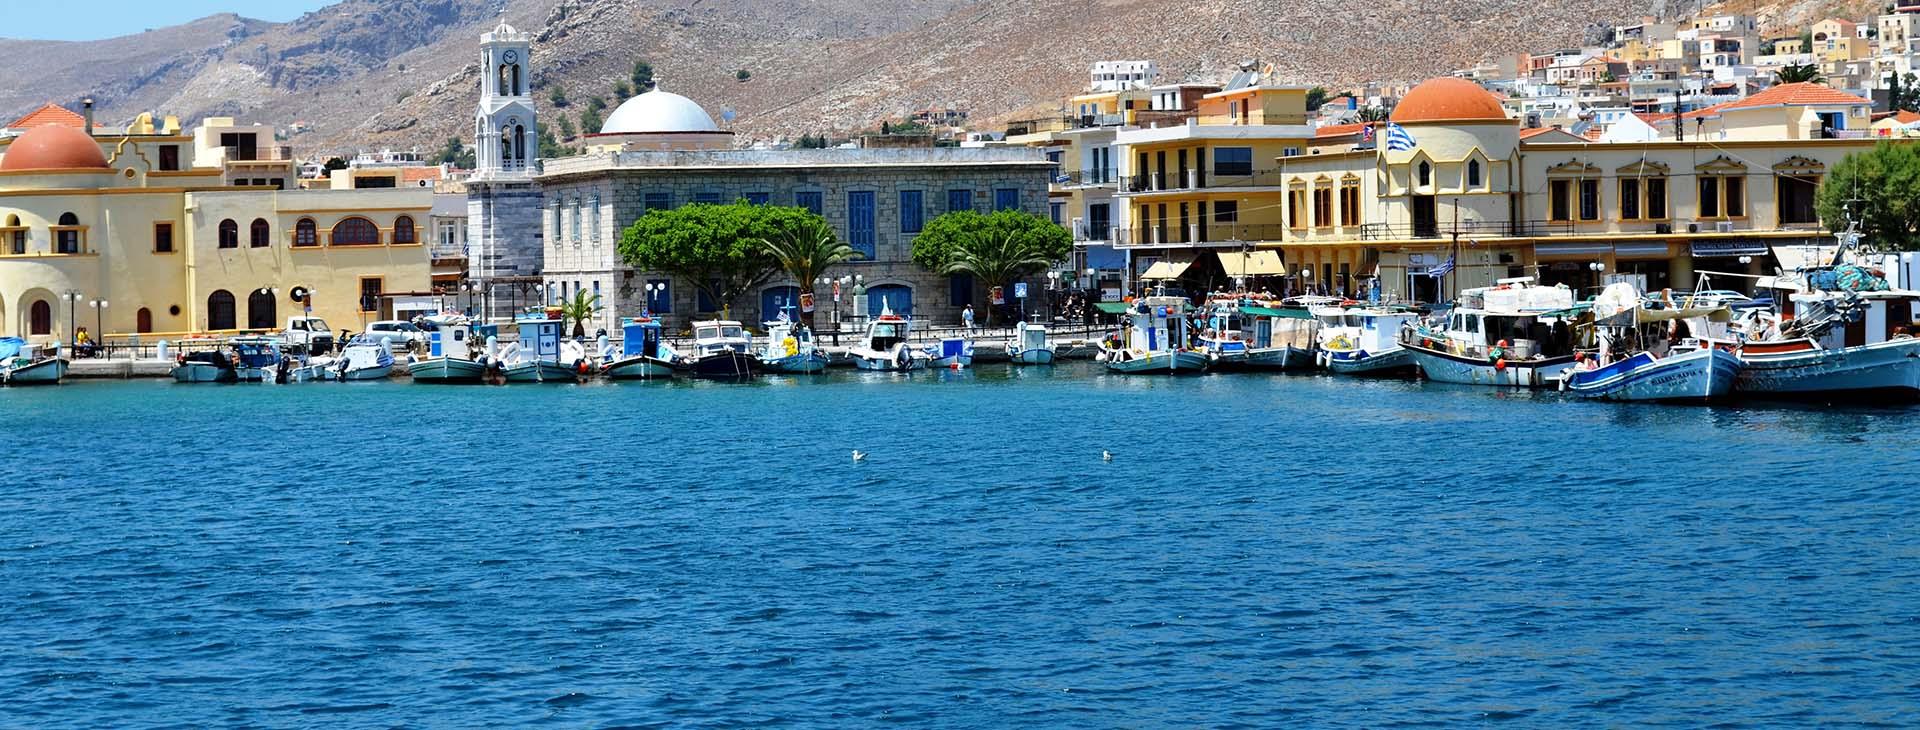 Kalimnos harbour